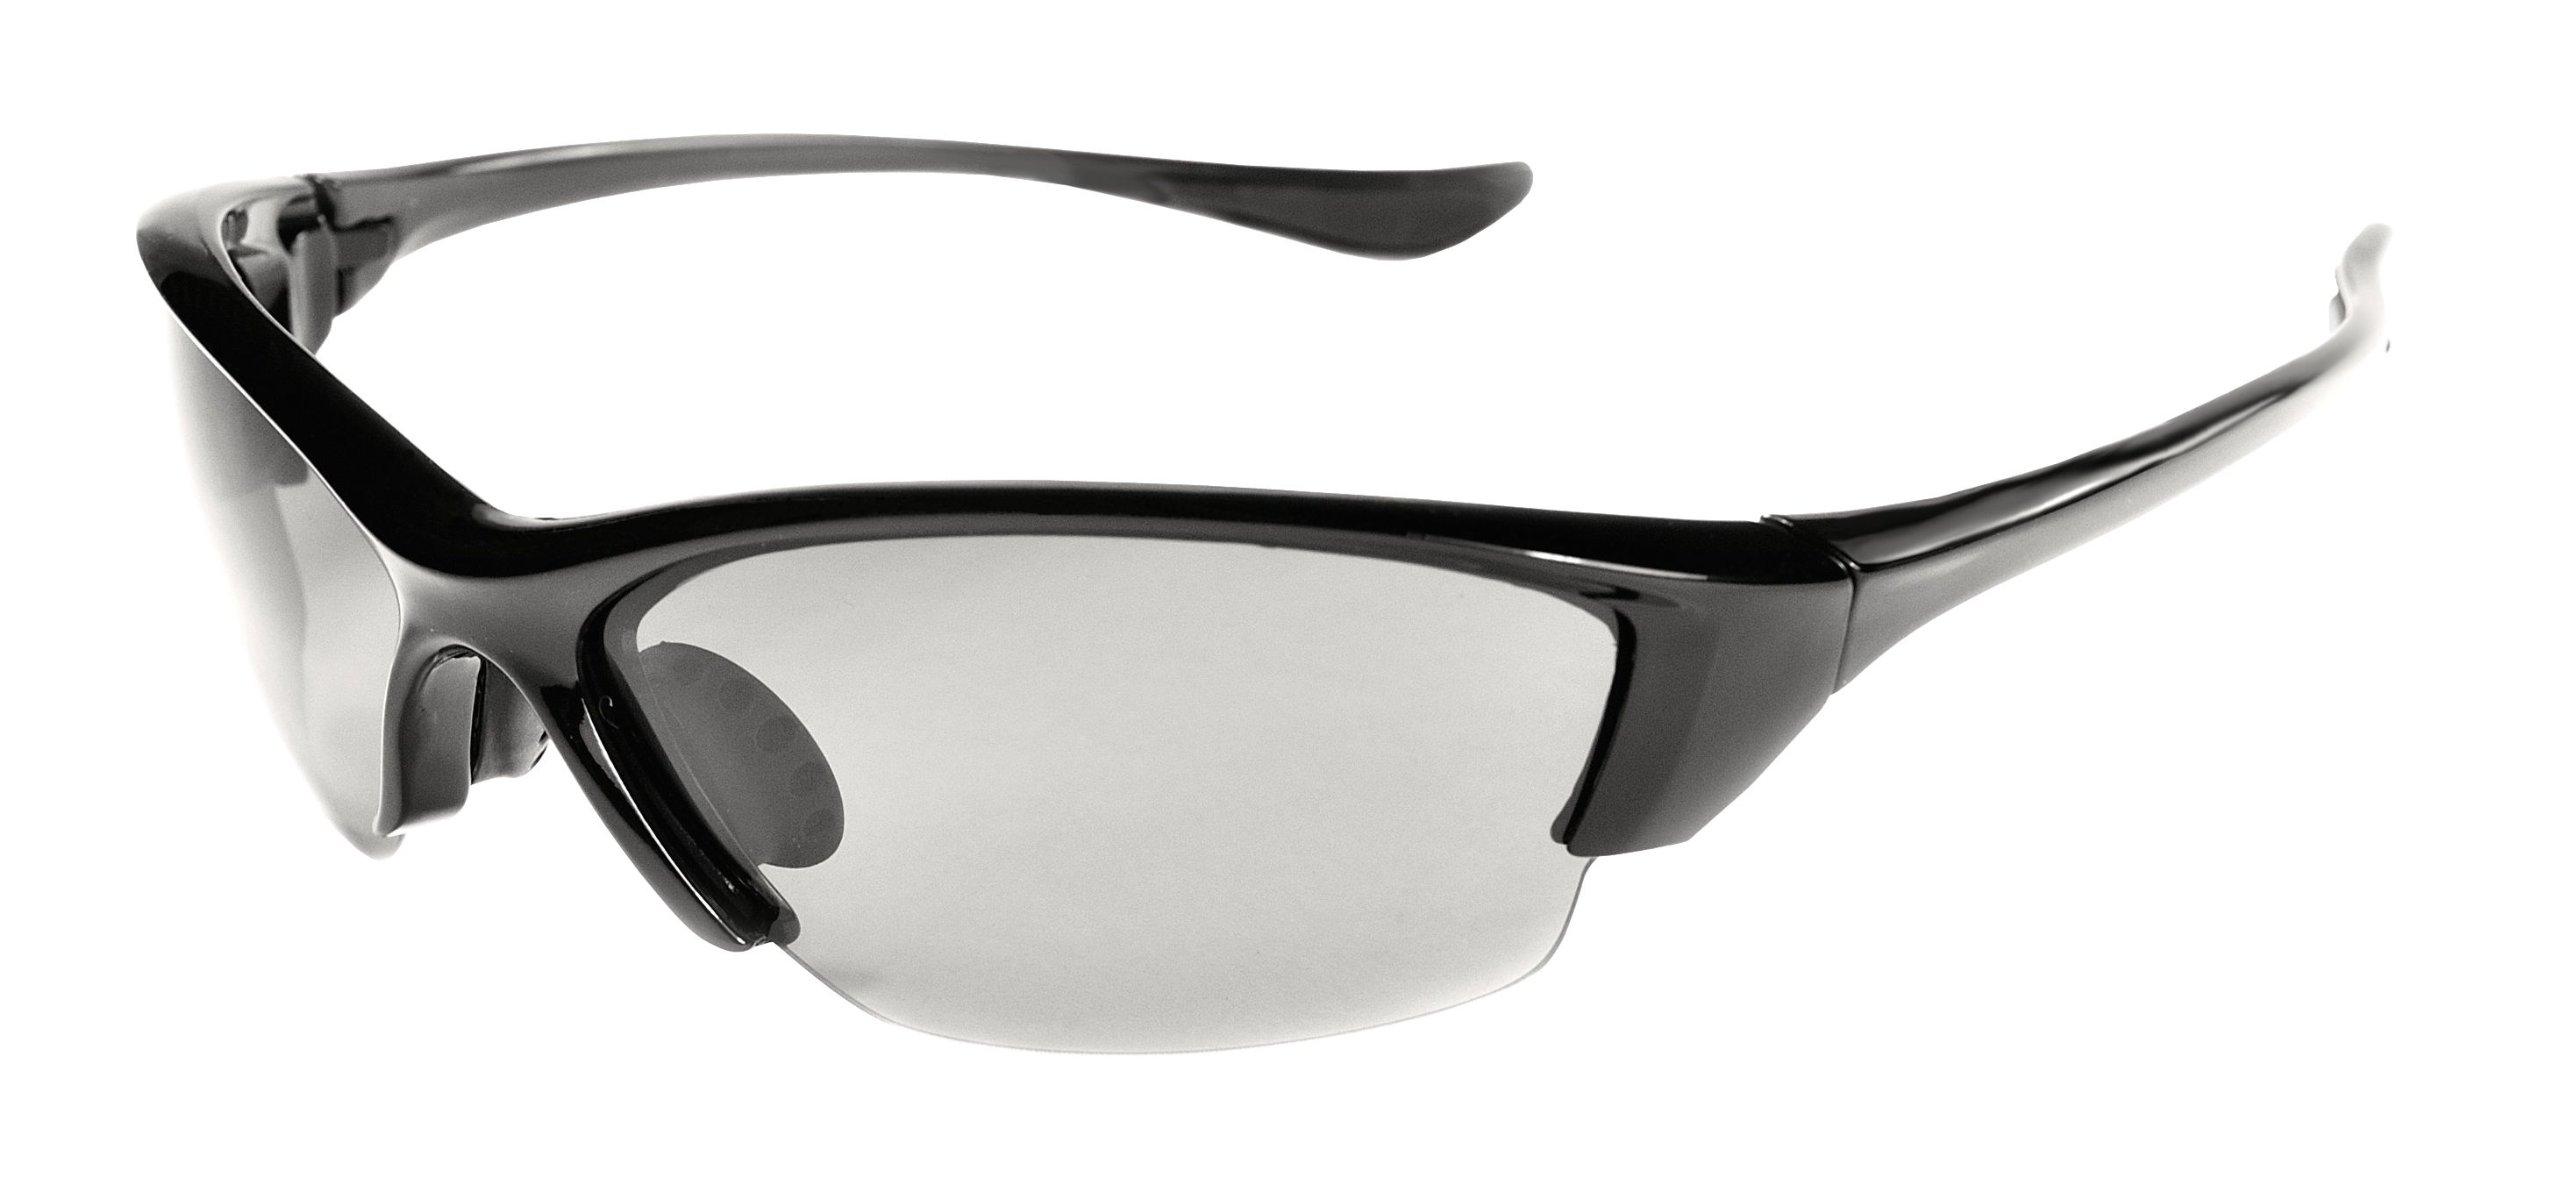 Polarized Sunglasses with TR90 Unbreakable Frame TRPL27 (Black & Smoke)